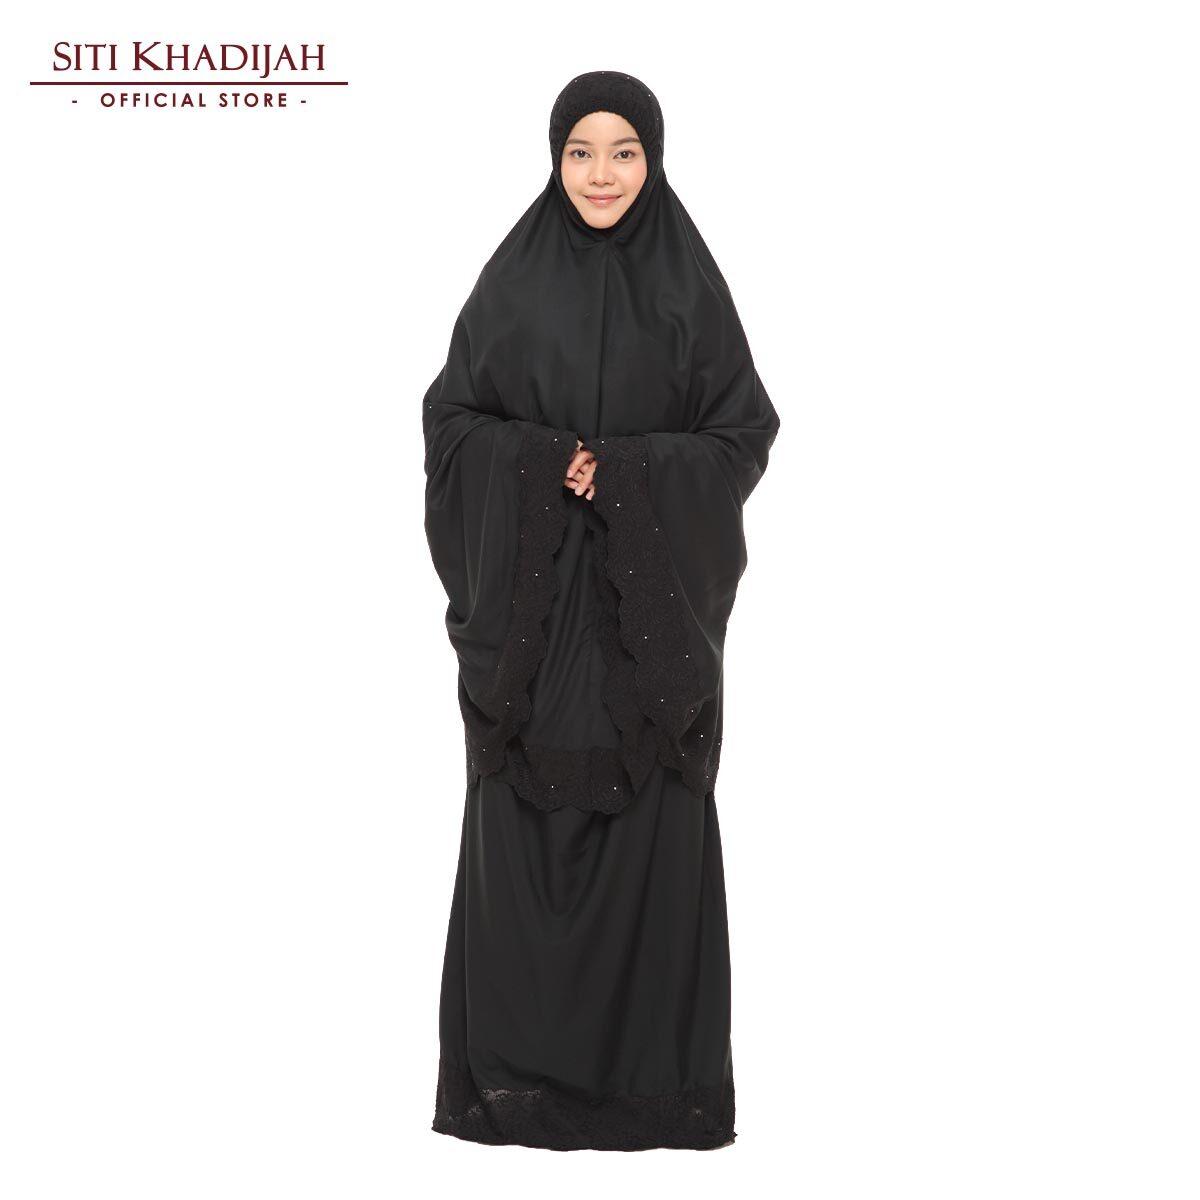 Siti Khadijah Classic Signature Aura Swarovski